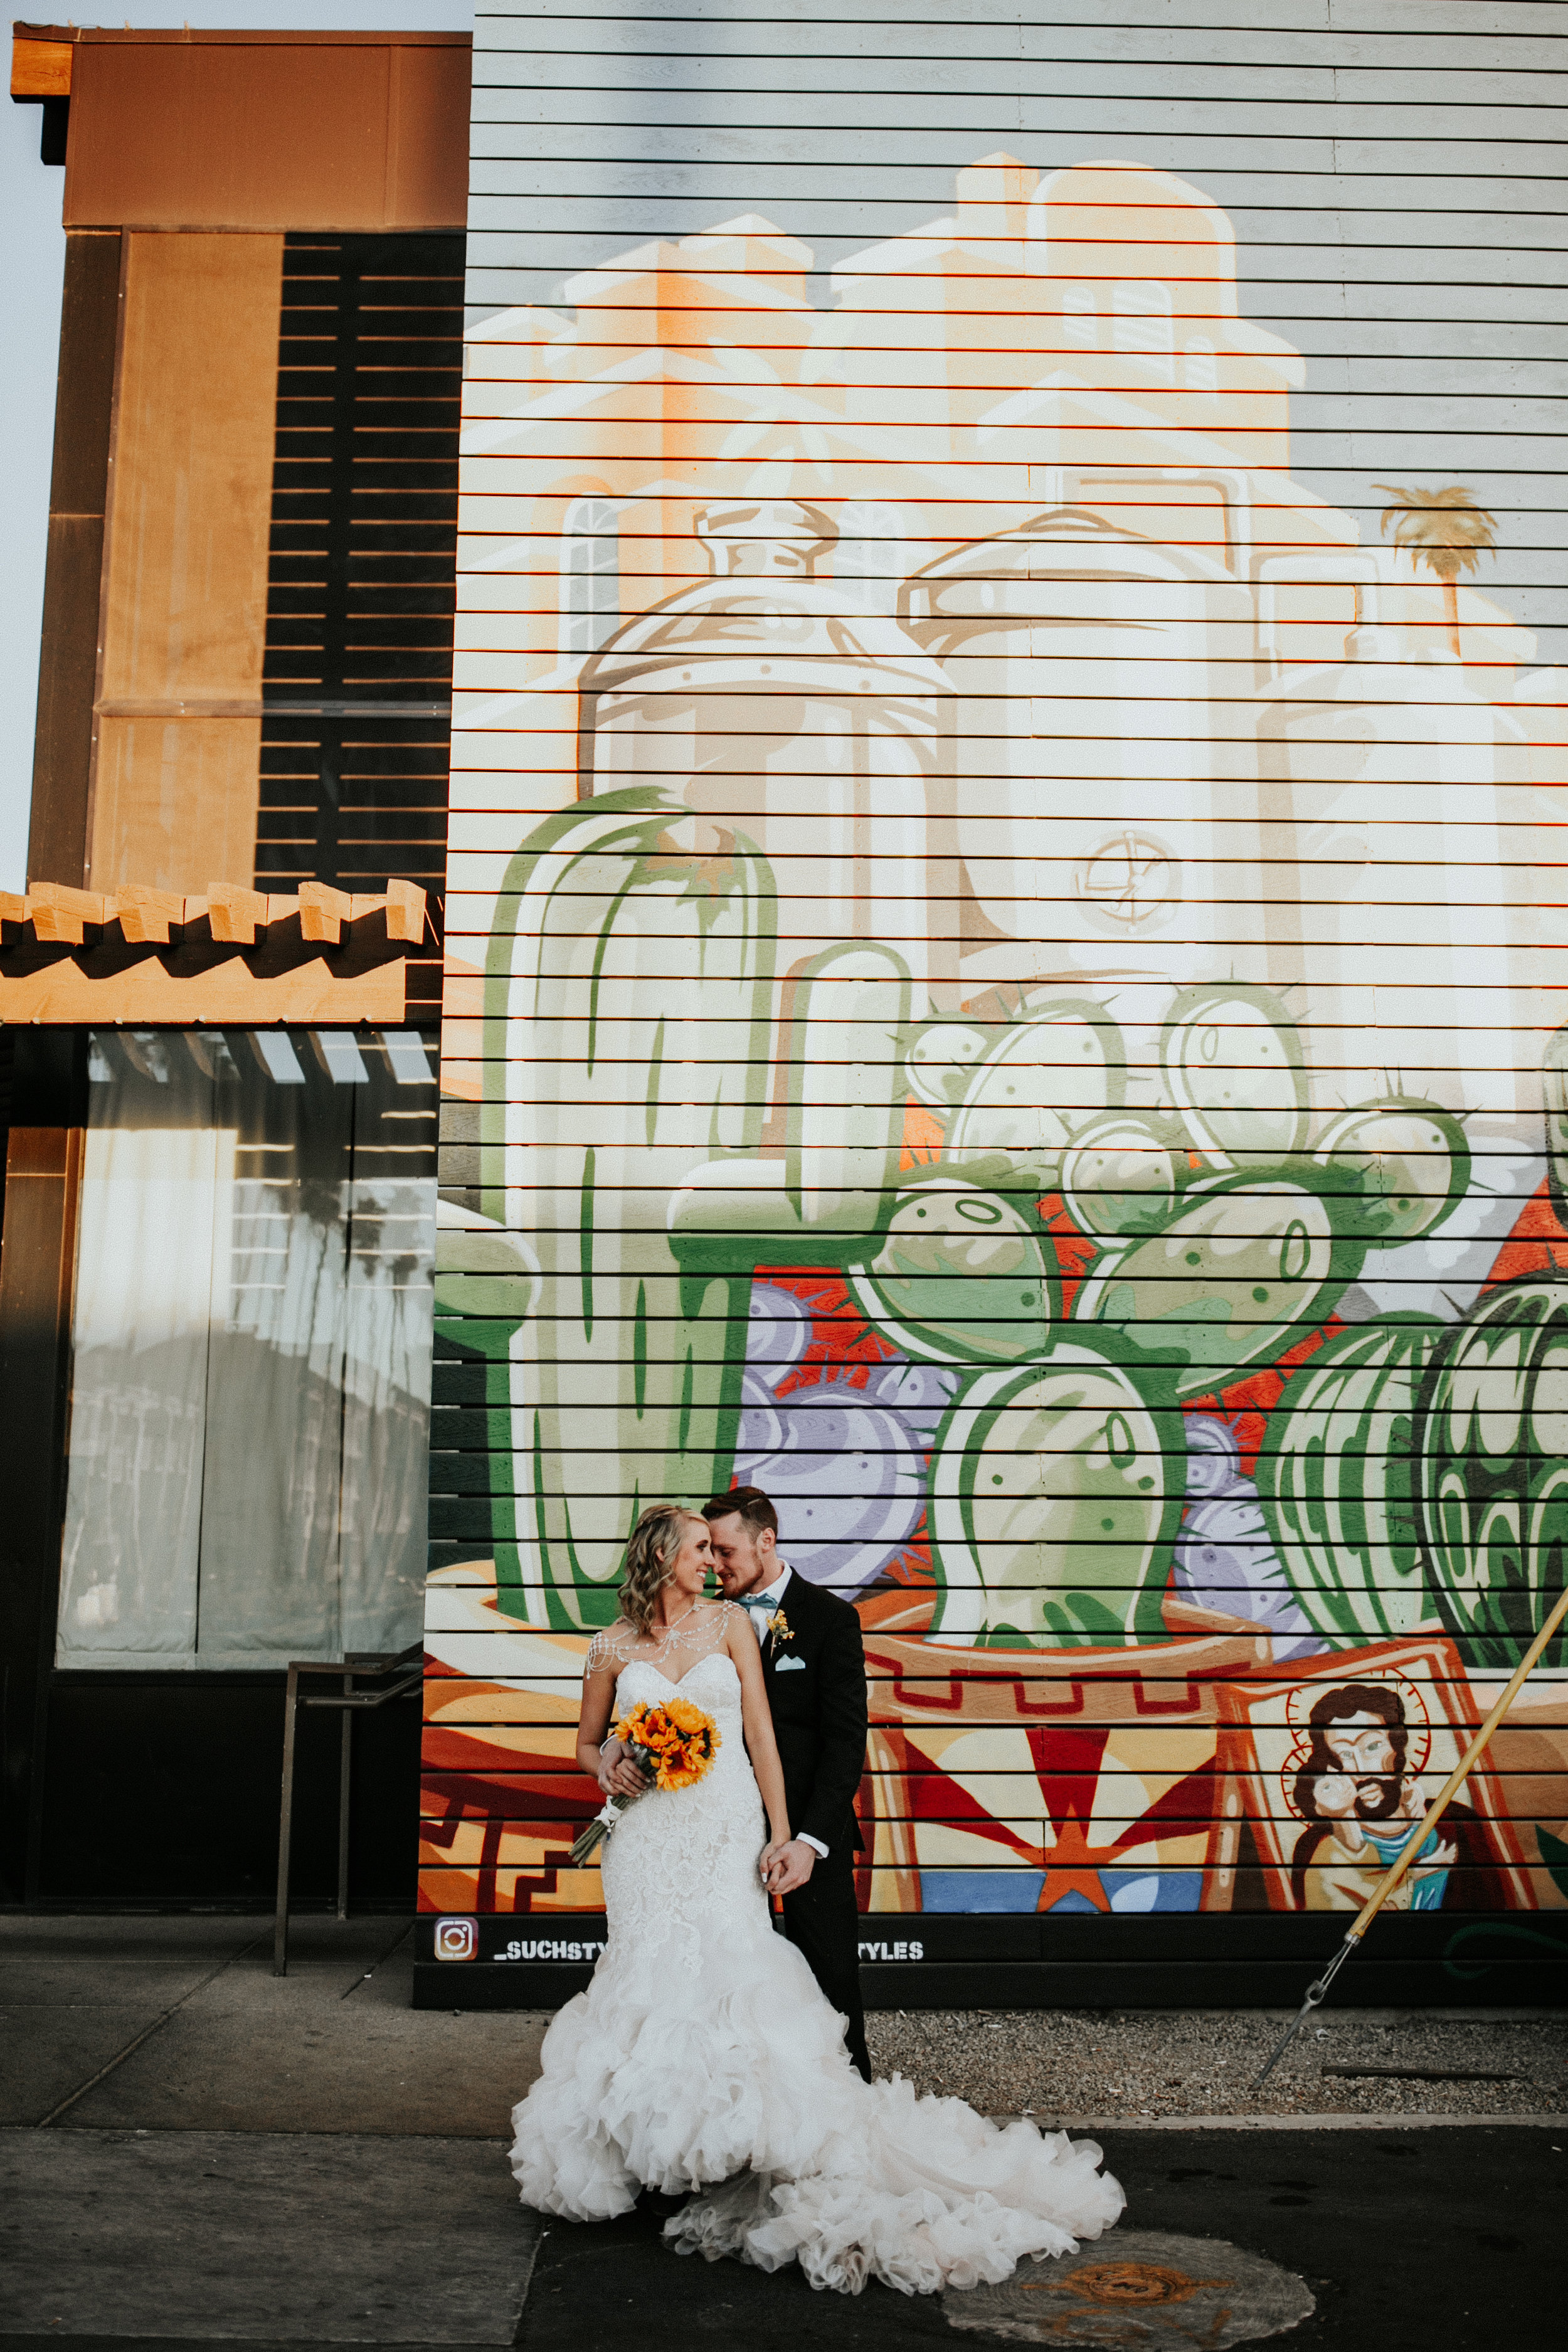 adventure-wedding-photographer-gracetphotography-45.jpg